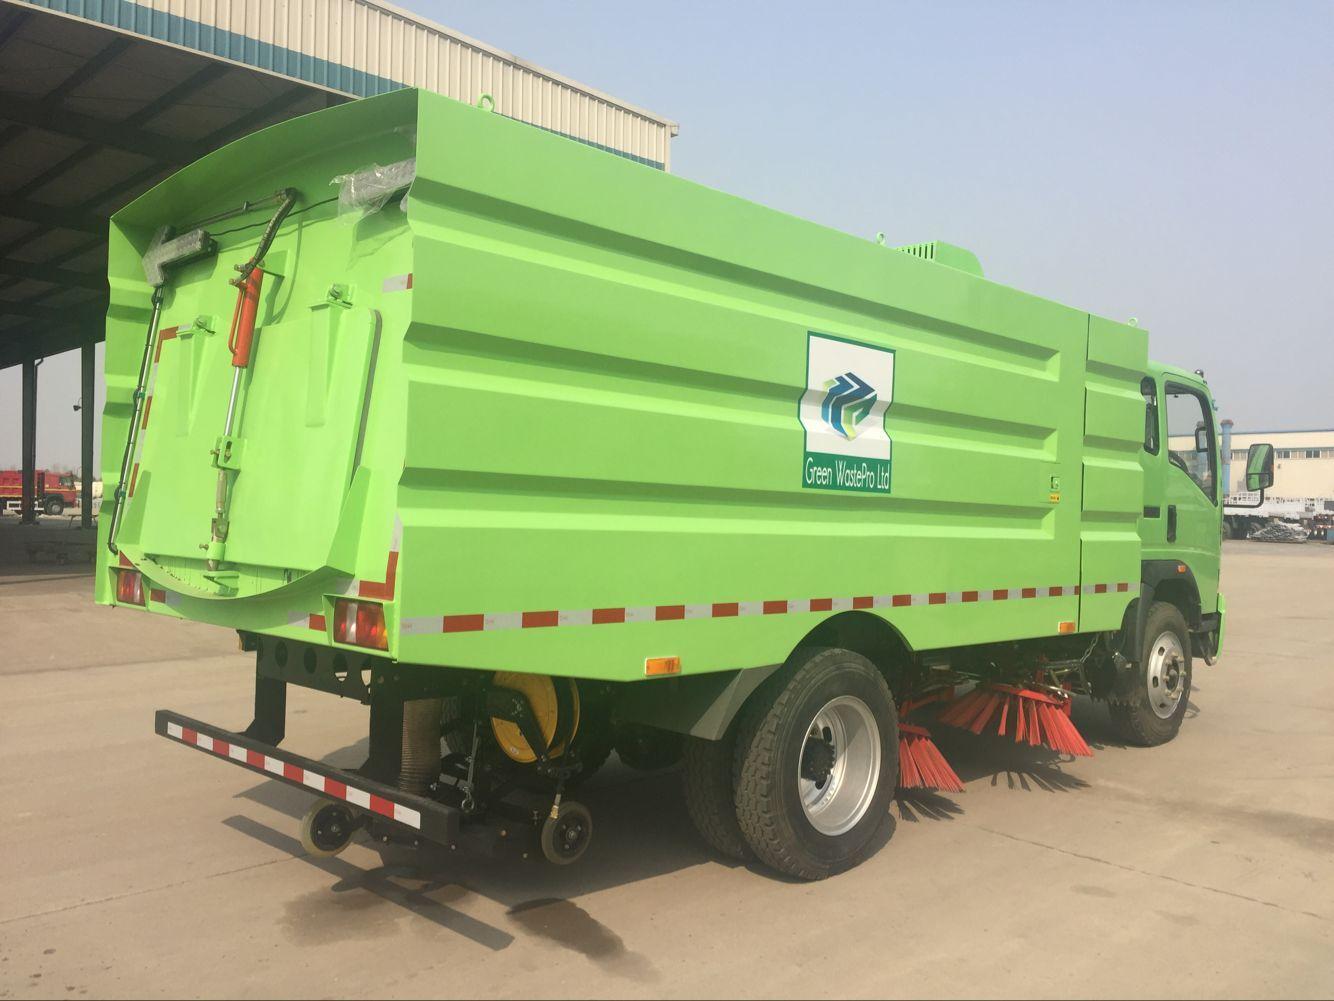 Tymco 600 Air Vacuum Street Sweeper (2006) : Heavy Duty Trucks